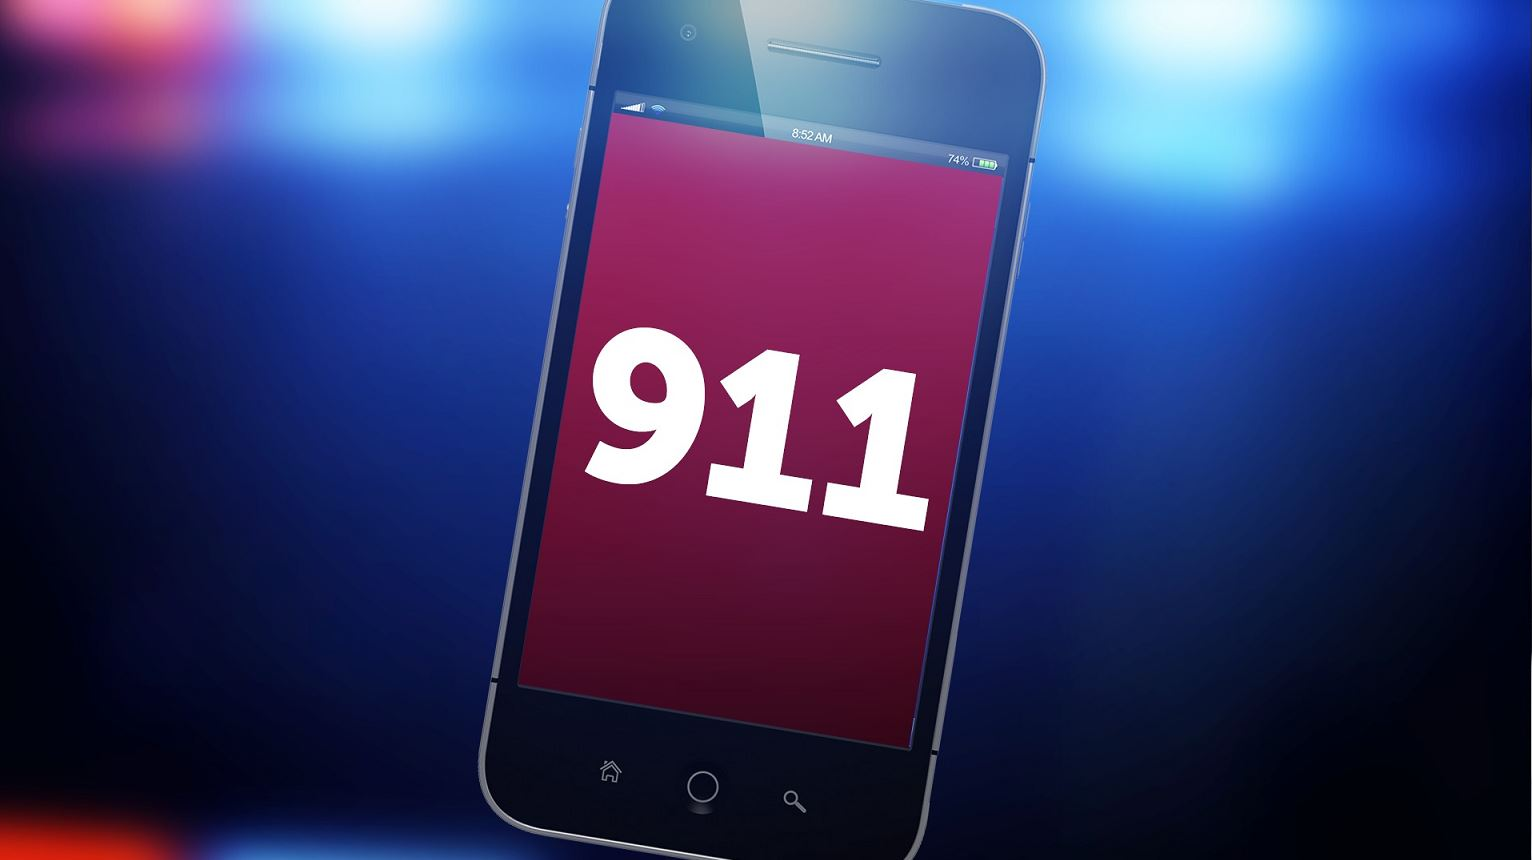 ACCIDENTAL 911 CALLS